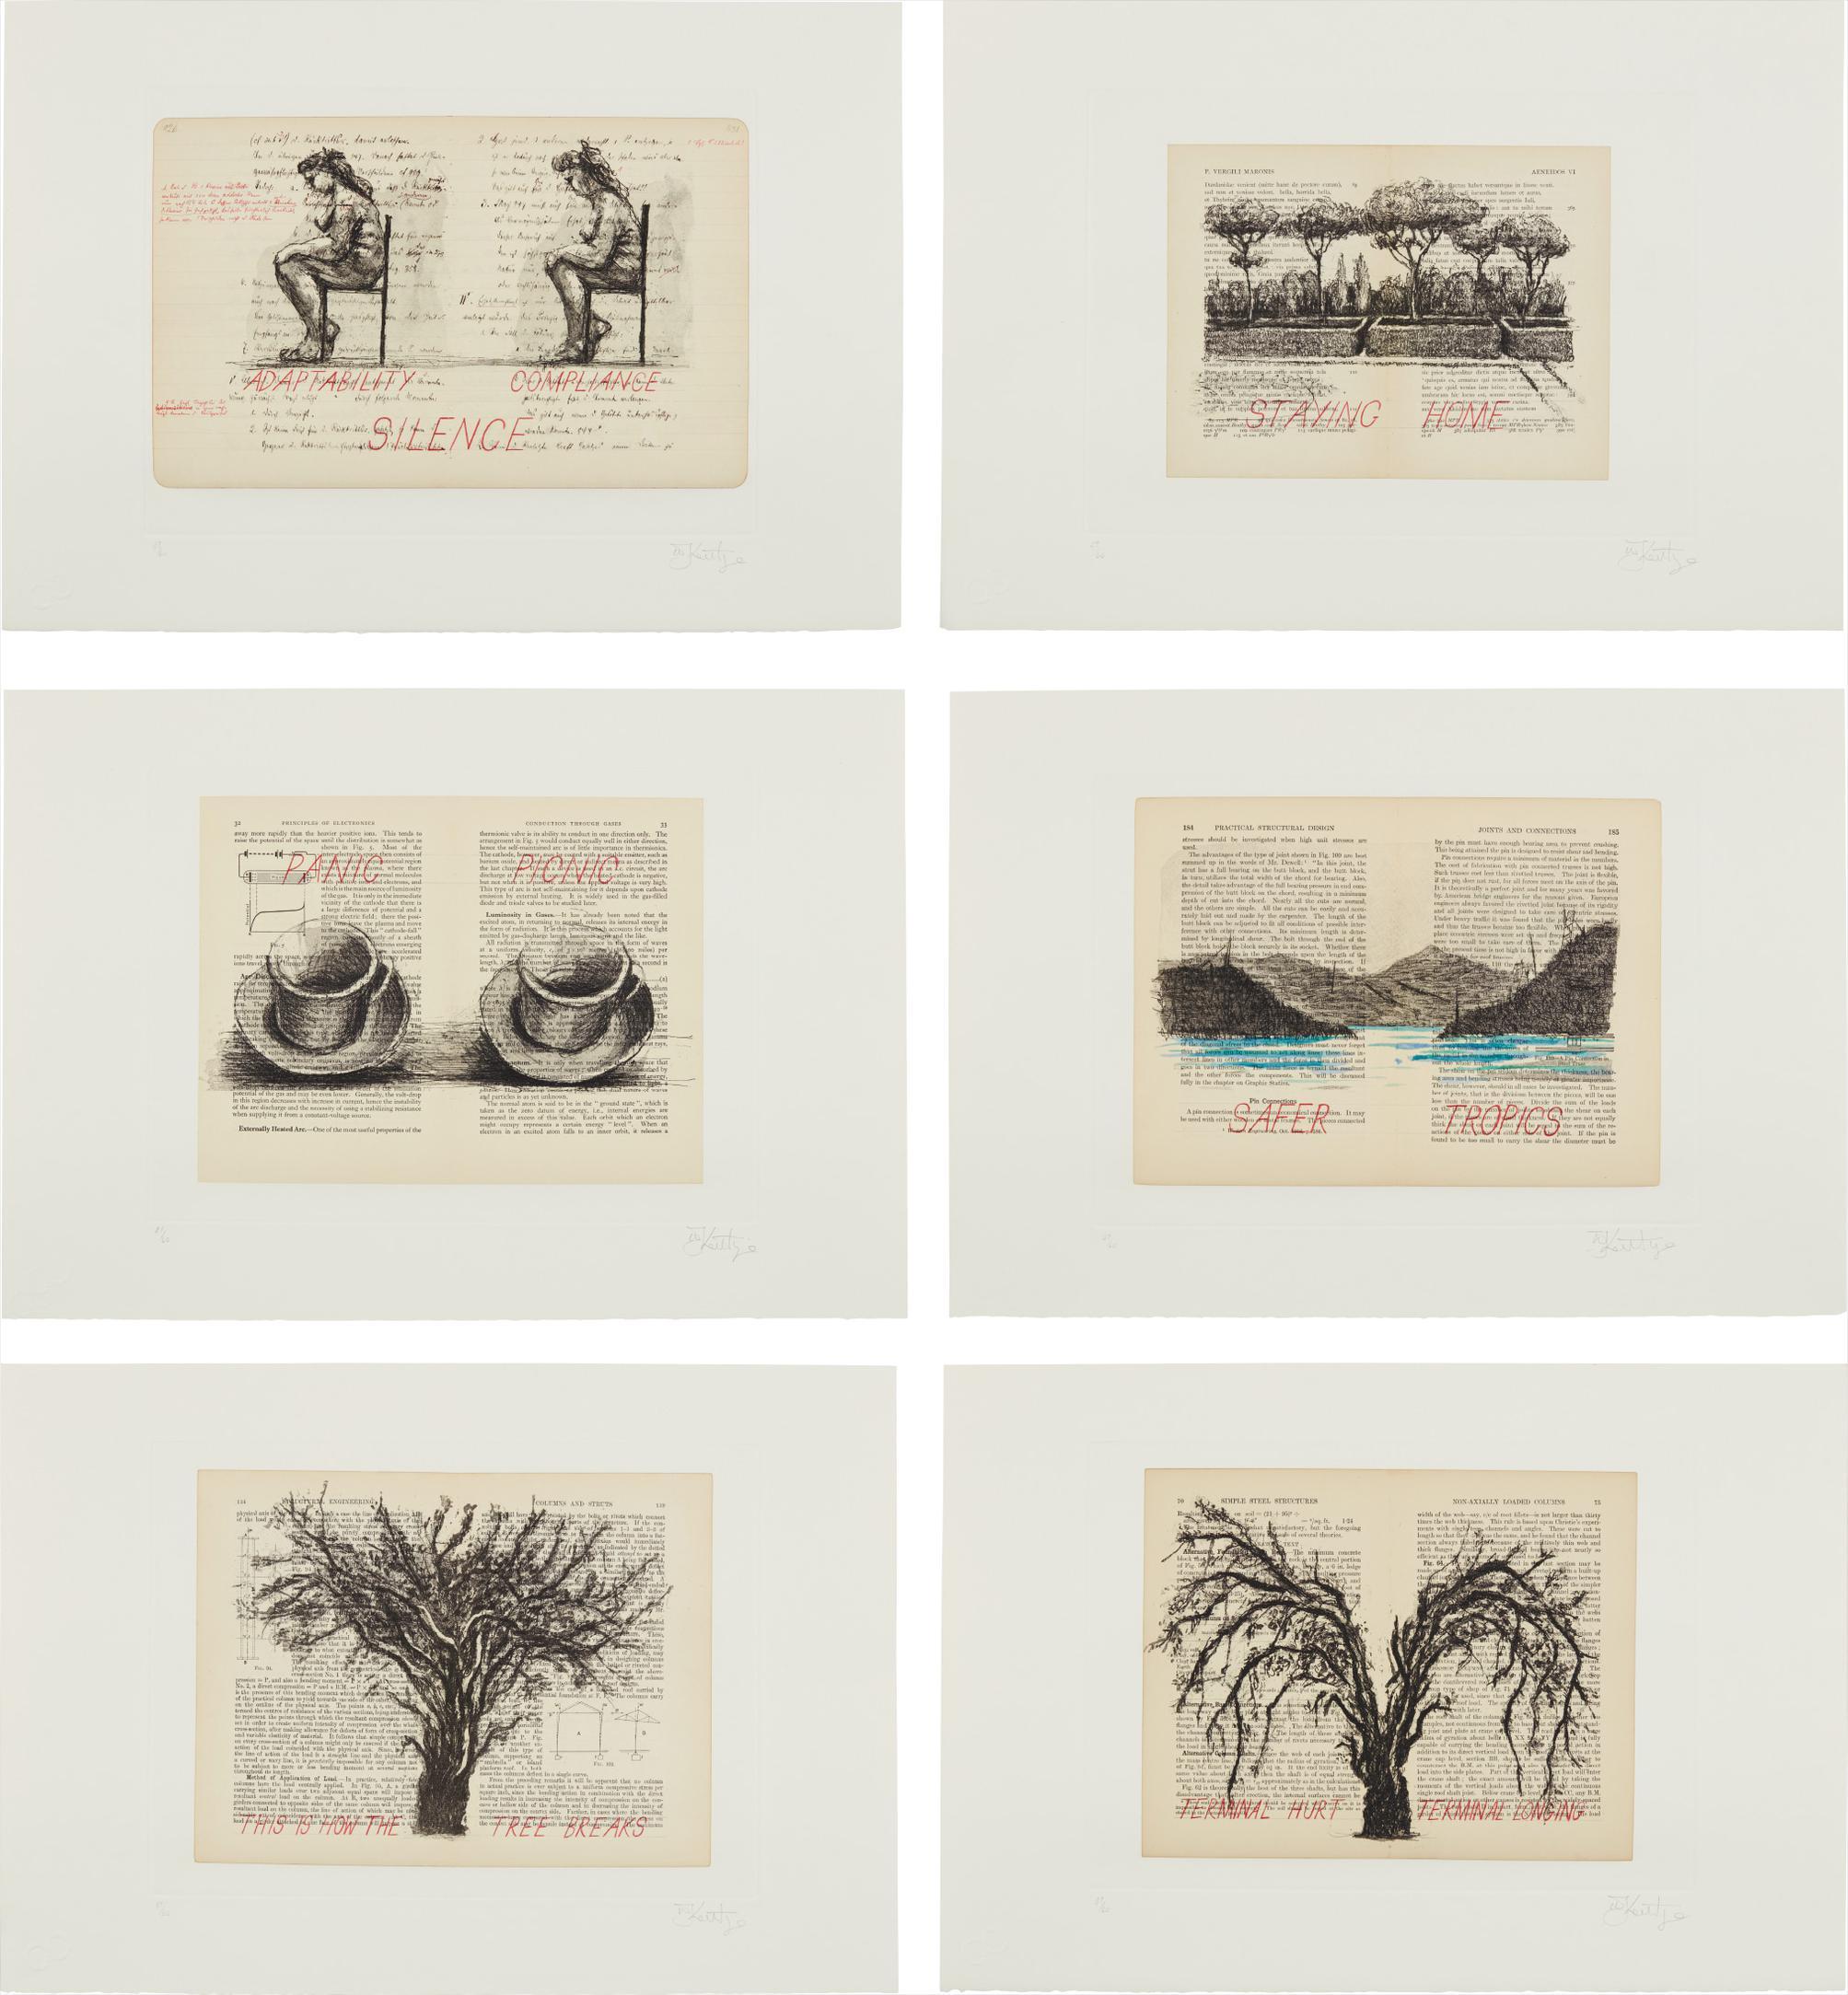 William Kentridge-Sleeping On Glass-1999